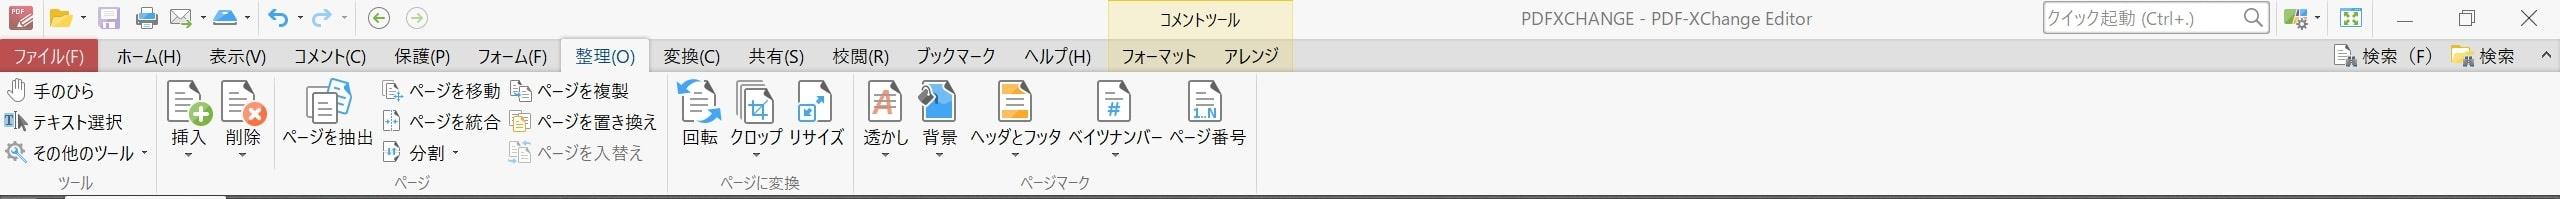 PDF-XChange-Editor 整理